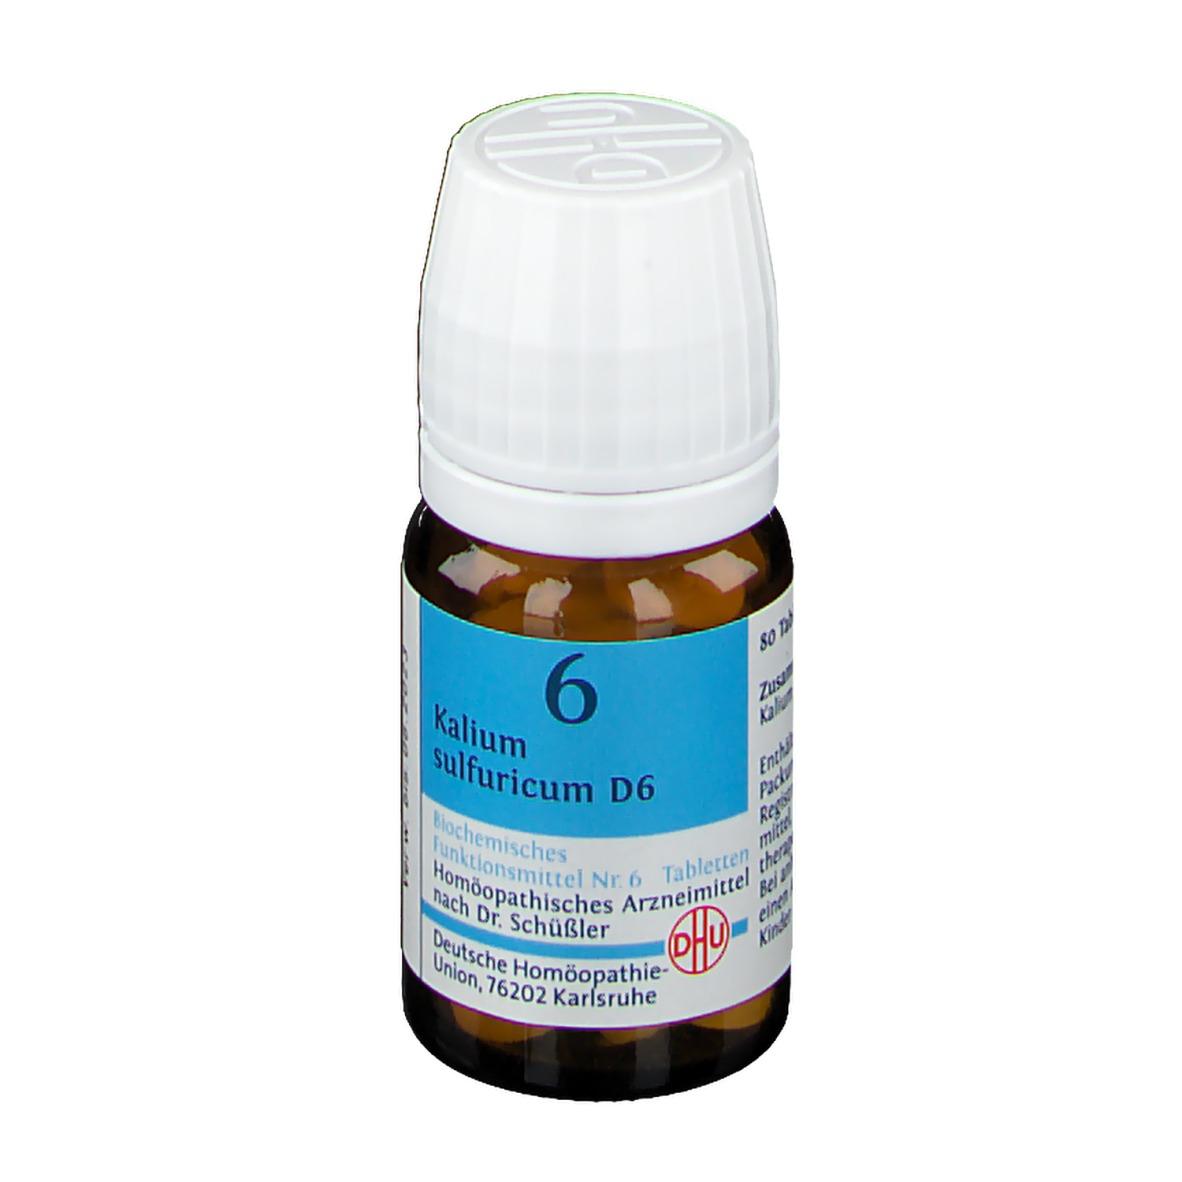 DHU Biochemie 6 Kalium sulfuricum D6